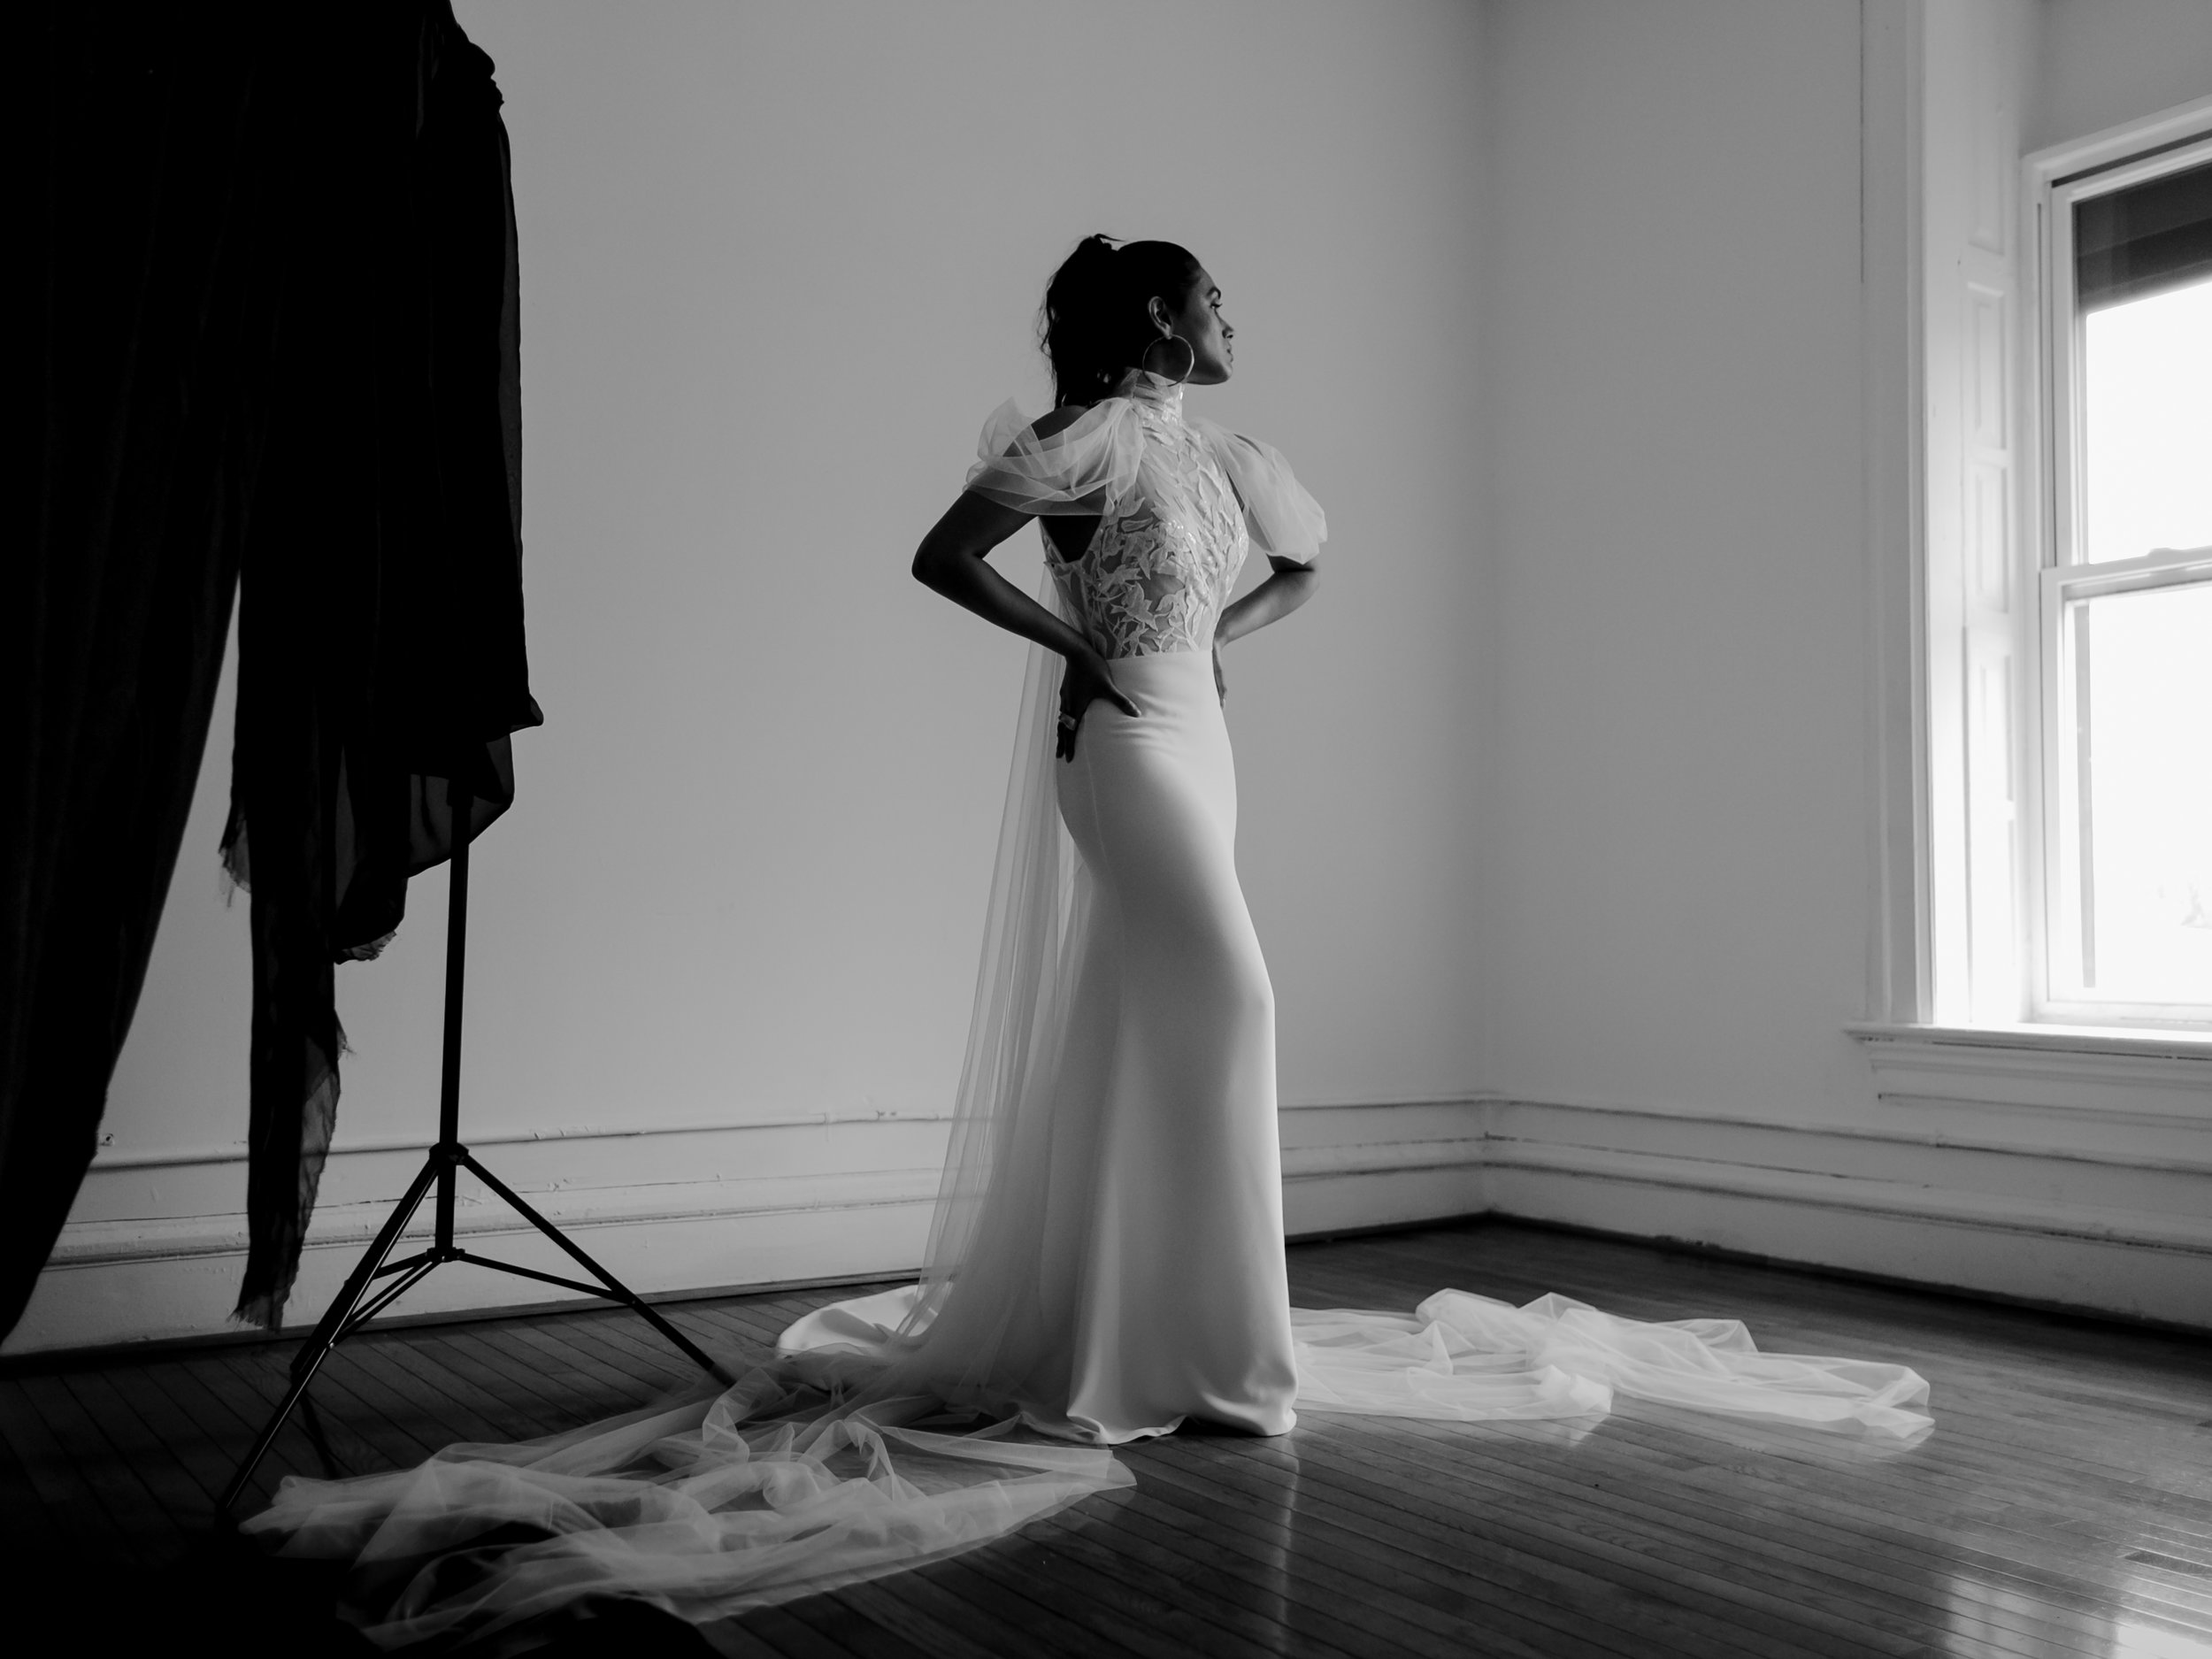 Chicago-Bride-Wedding-Dress-Varca-Edited-252.jpg